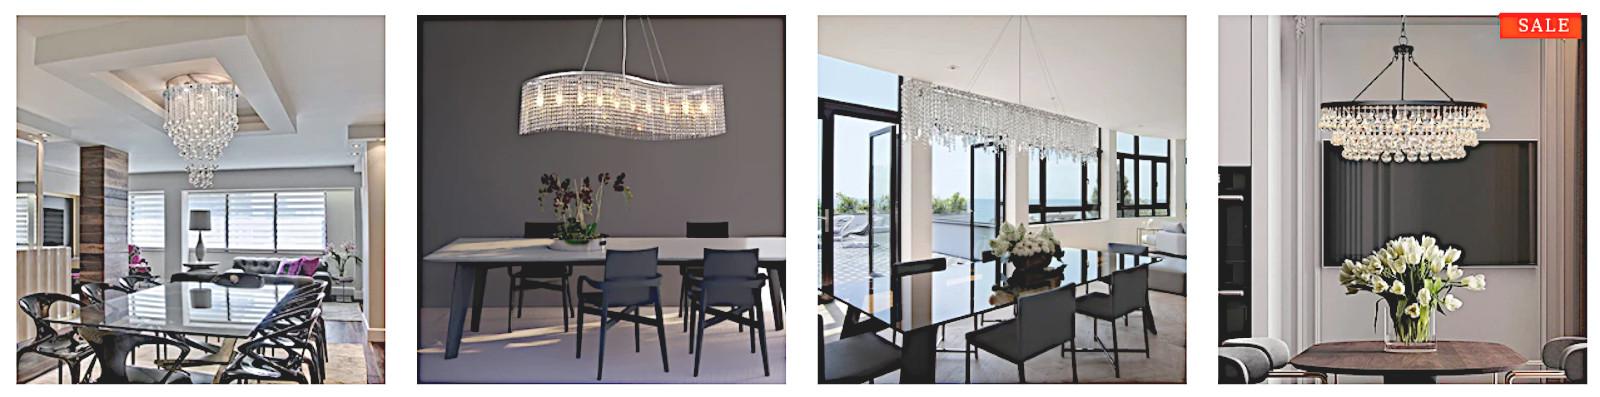 Outstanding dining room chandeliers